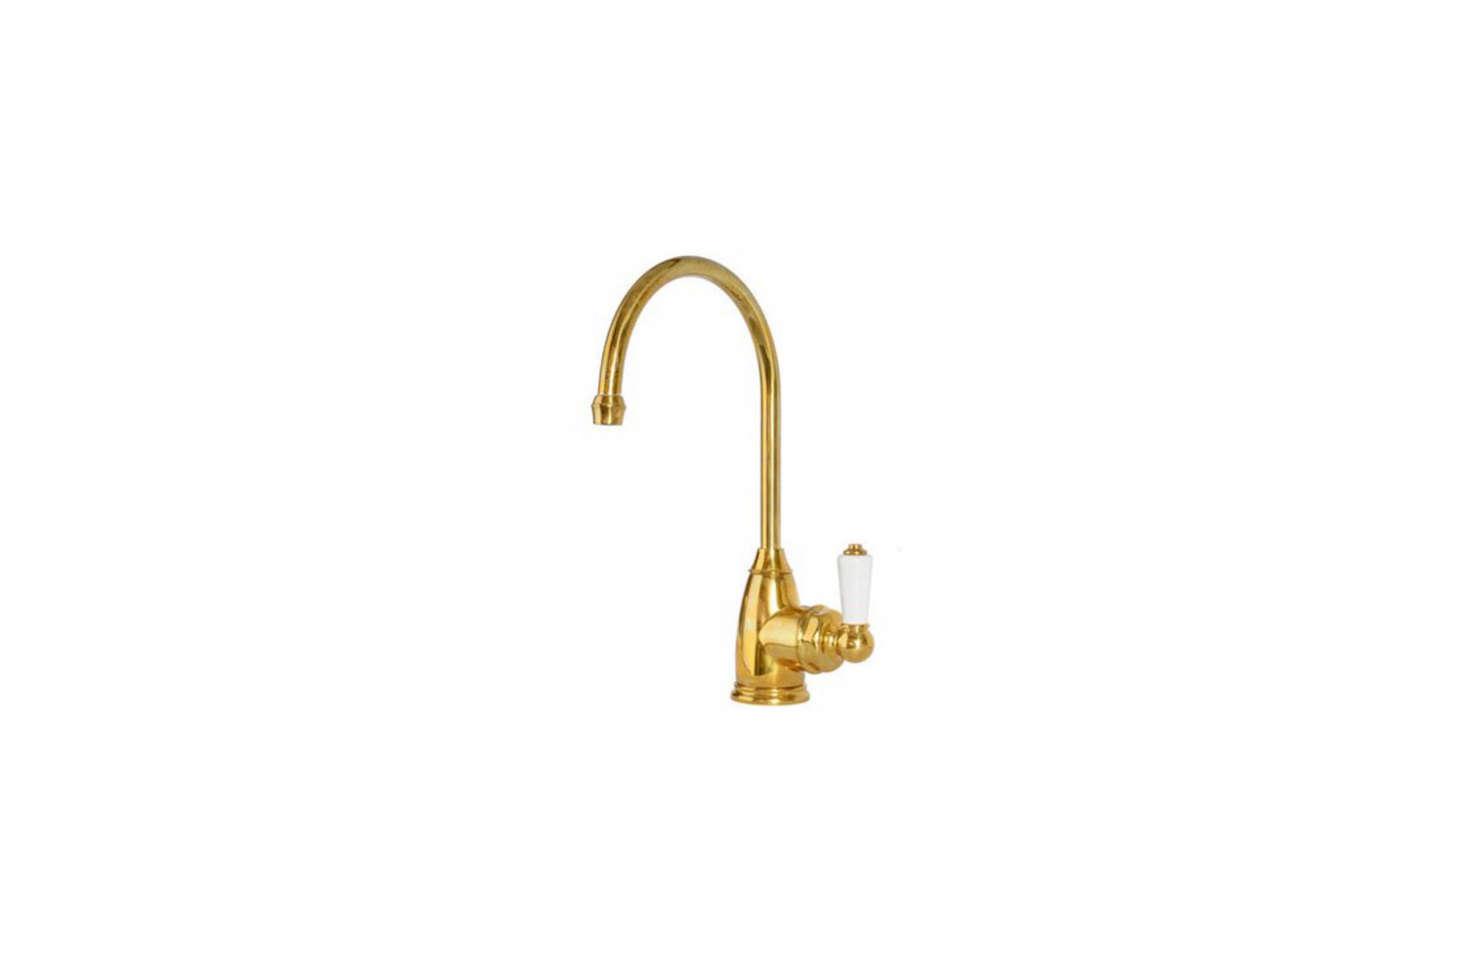 The deVOL Aged Brass Parthian Mini Instant Hot Tap is $